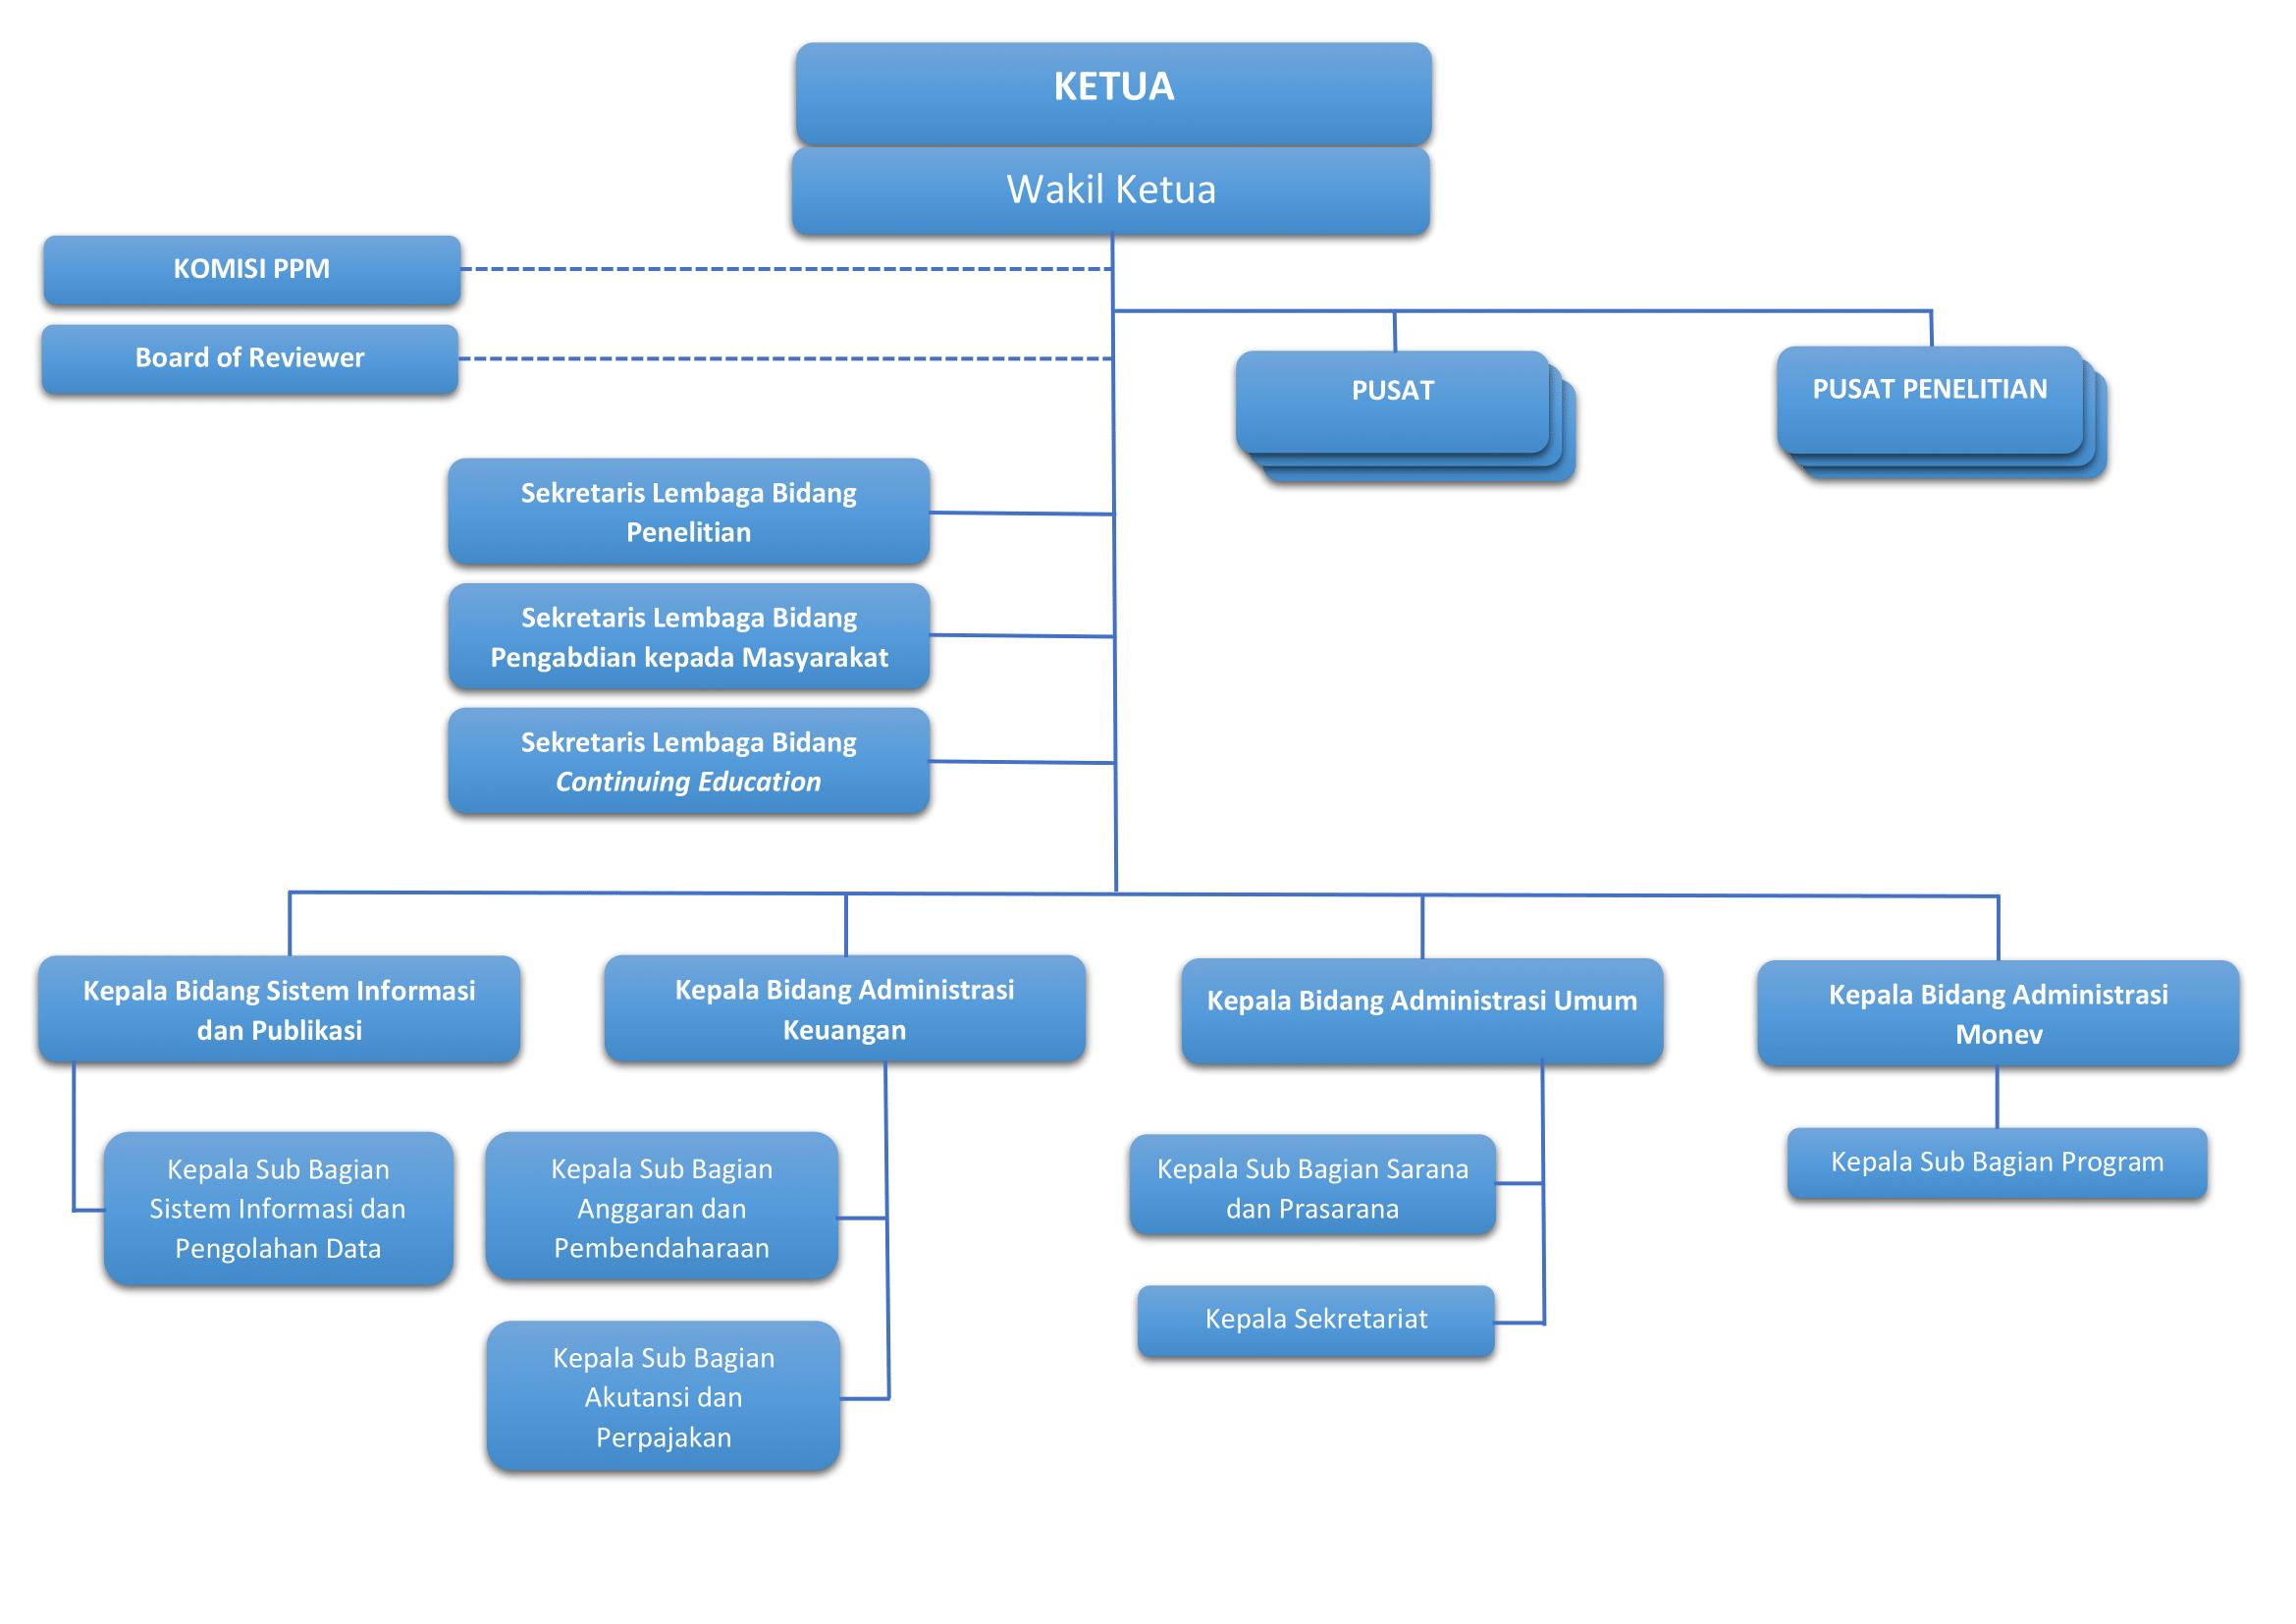 Struktur Organisasi UPPM